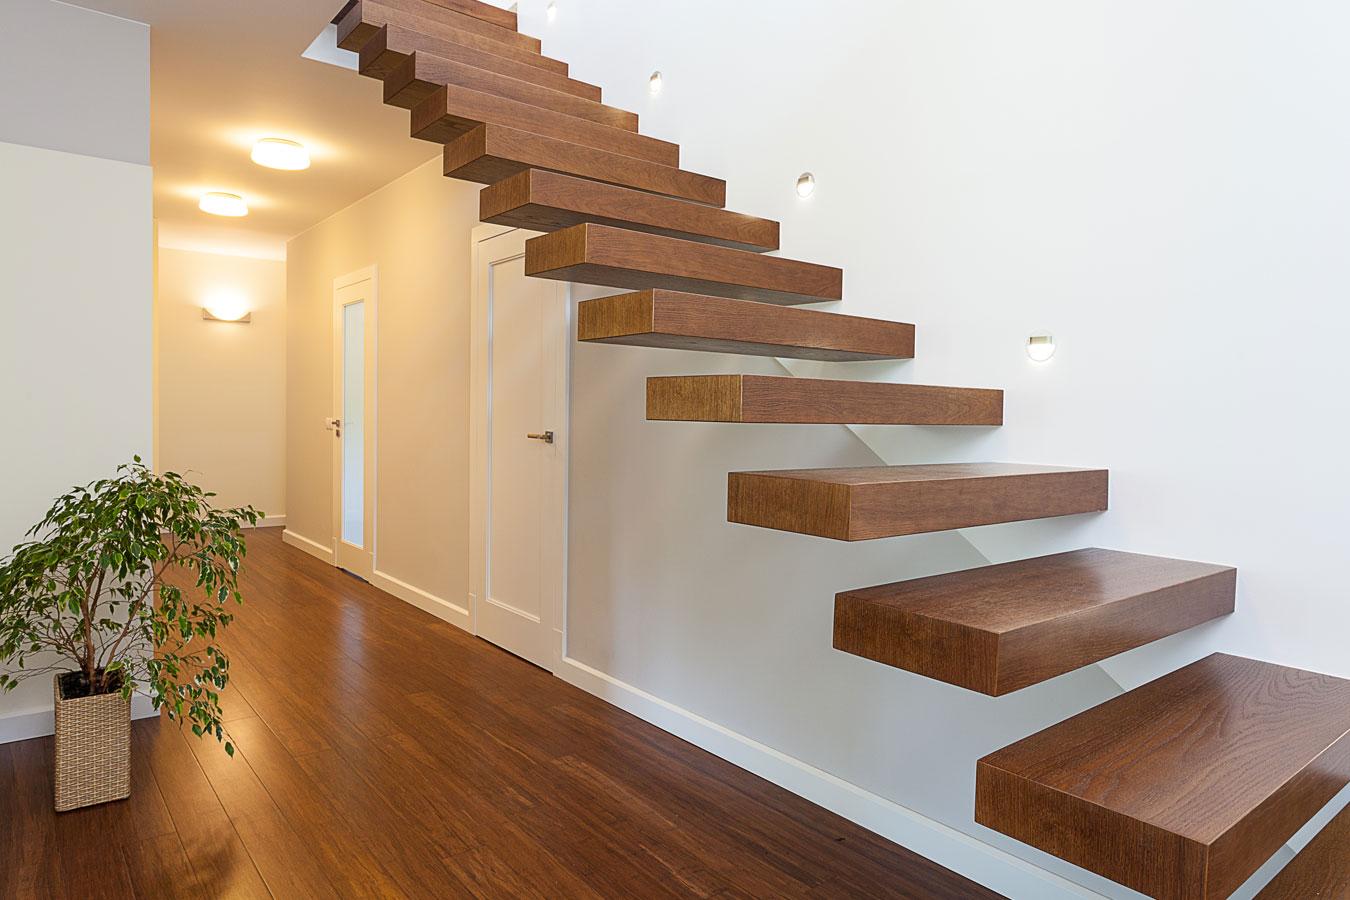 houten trap met zwevende tredes zolder slaapkamer